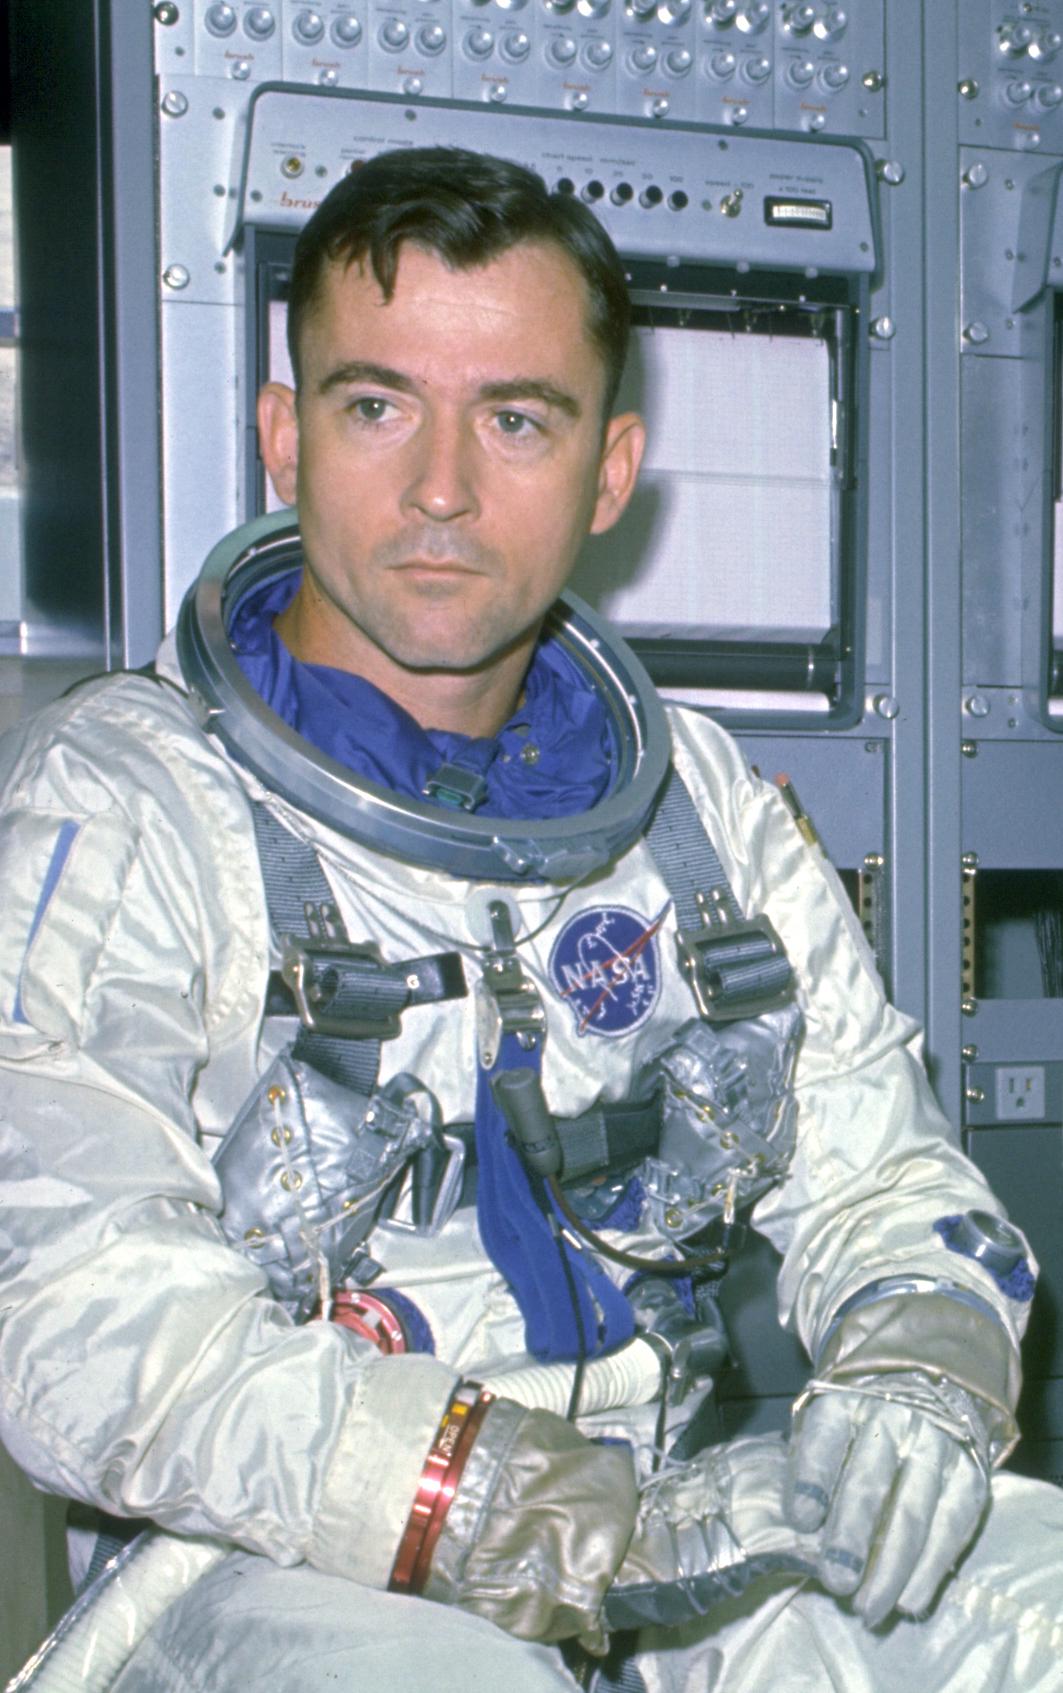 File:John Young (Gemini 3).jpg - Wikimedia Commons